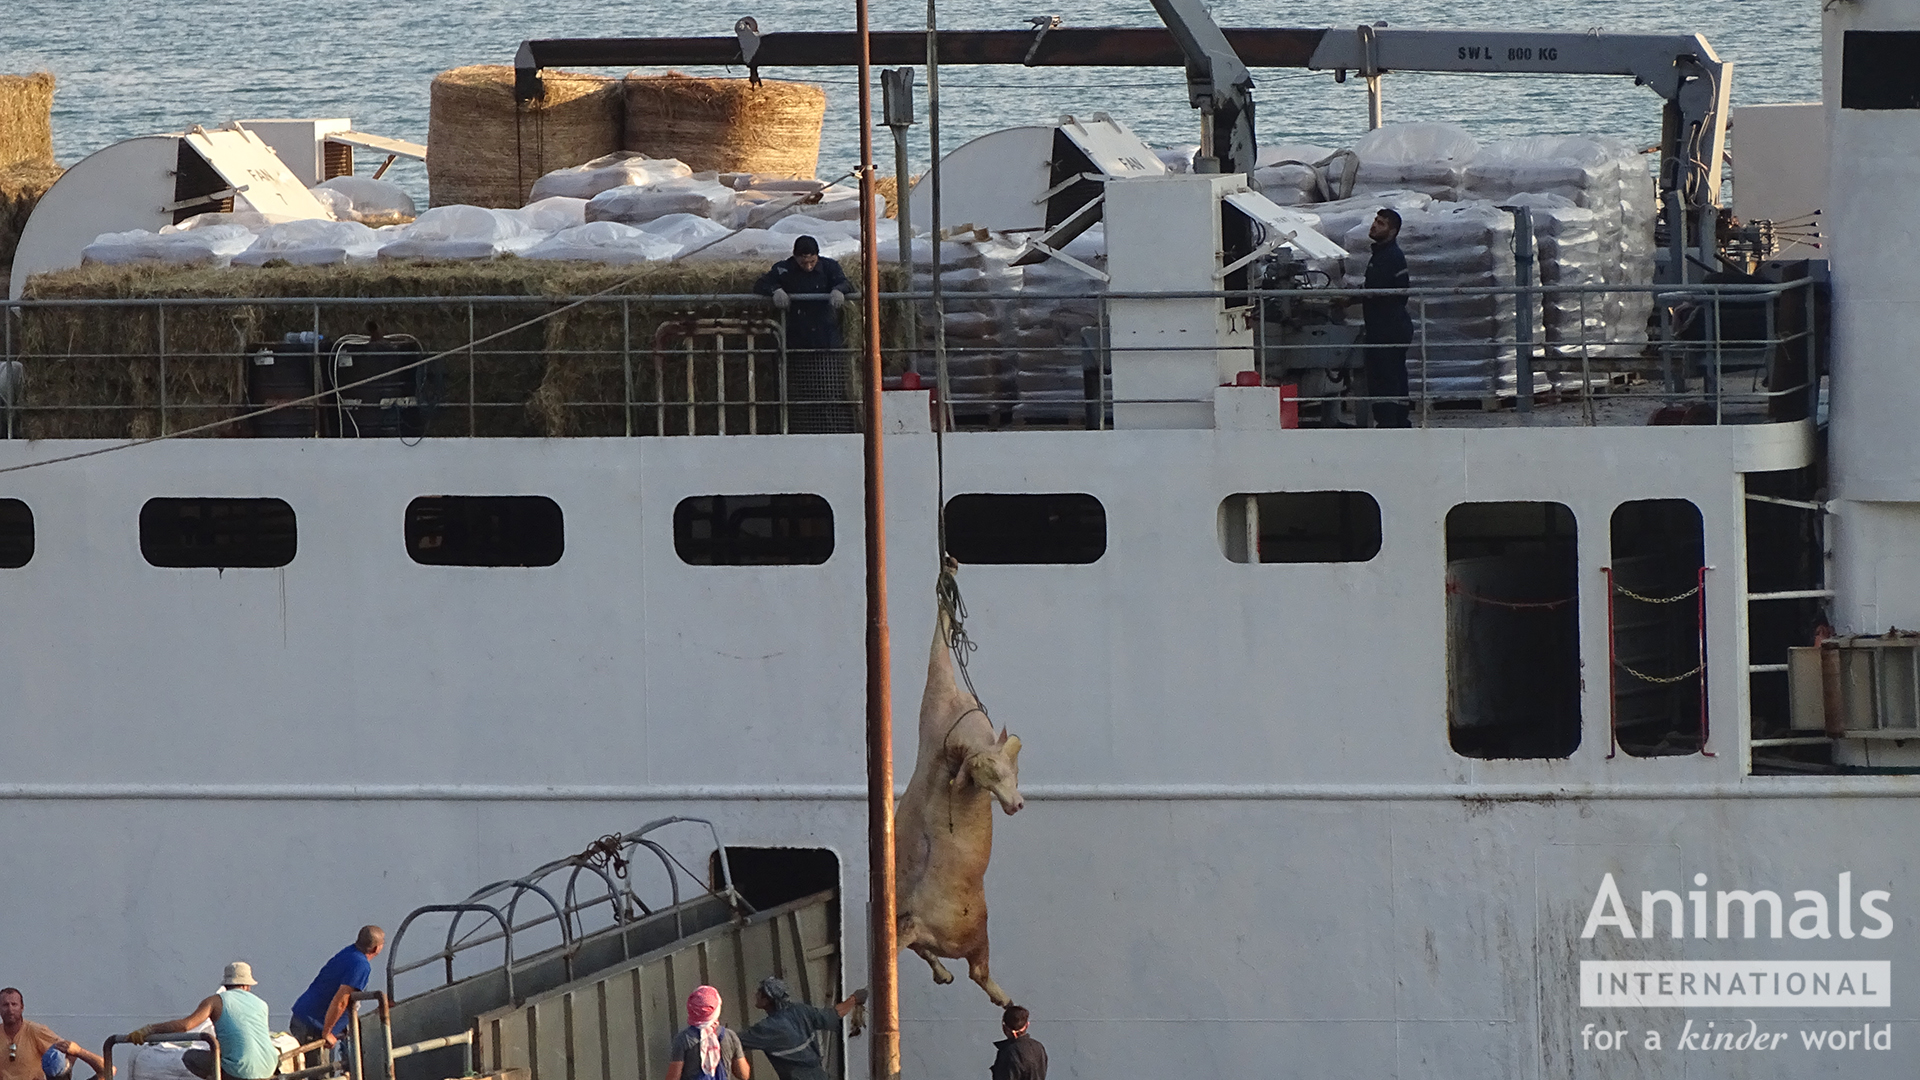 39806_2018_Port_of_Rasa_bull_cranedon_vessel_